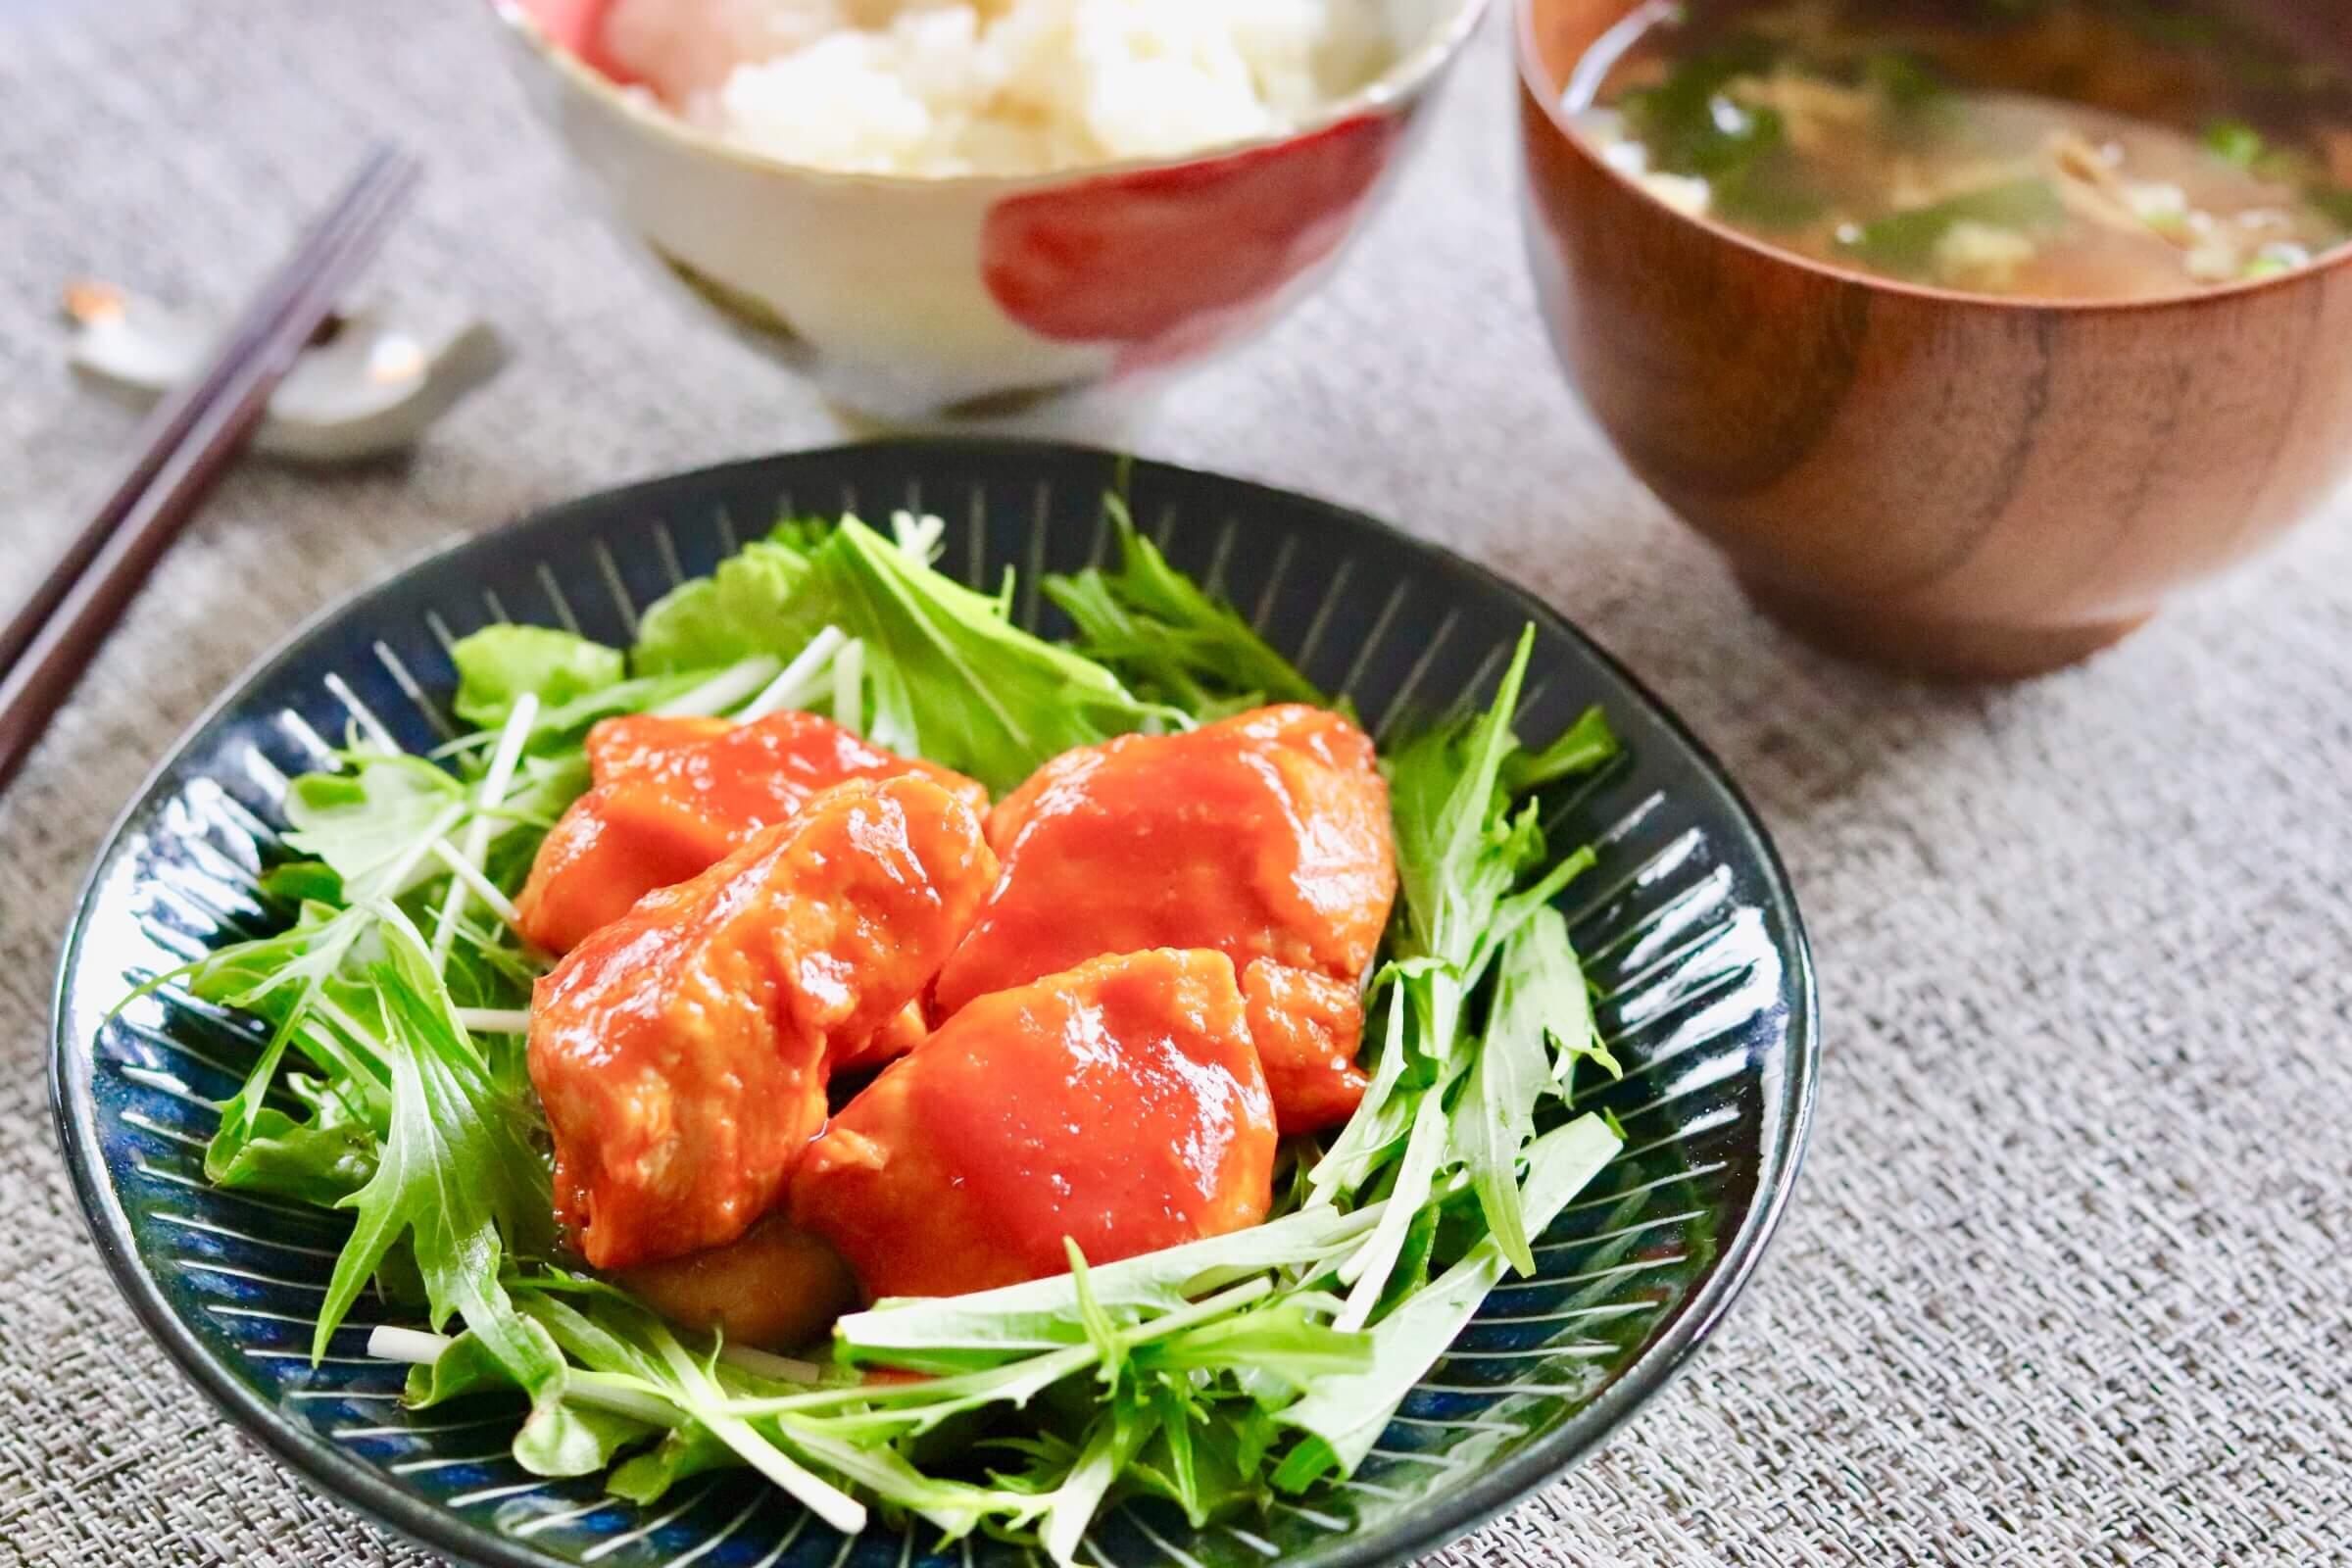 河村桃子|管理栄養士|レシピ作成